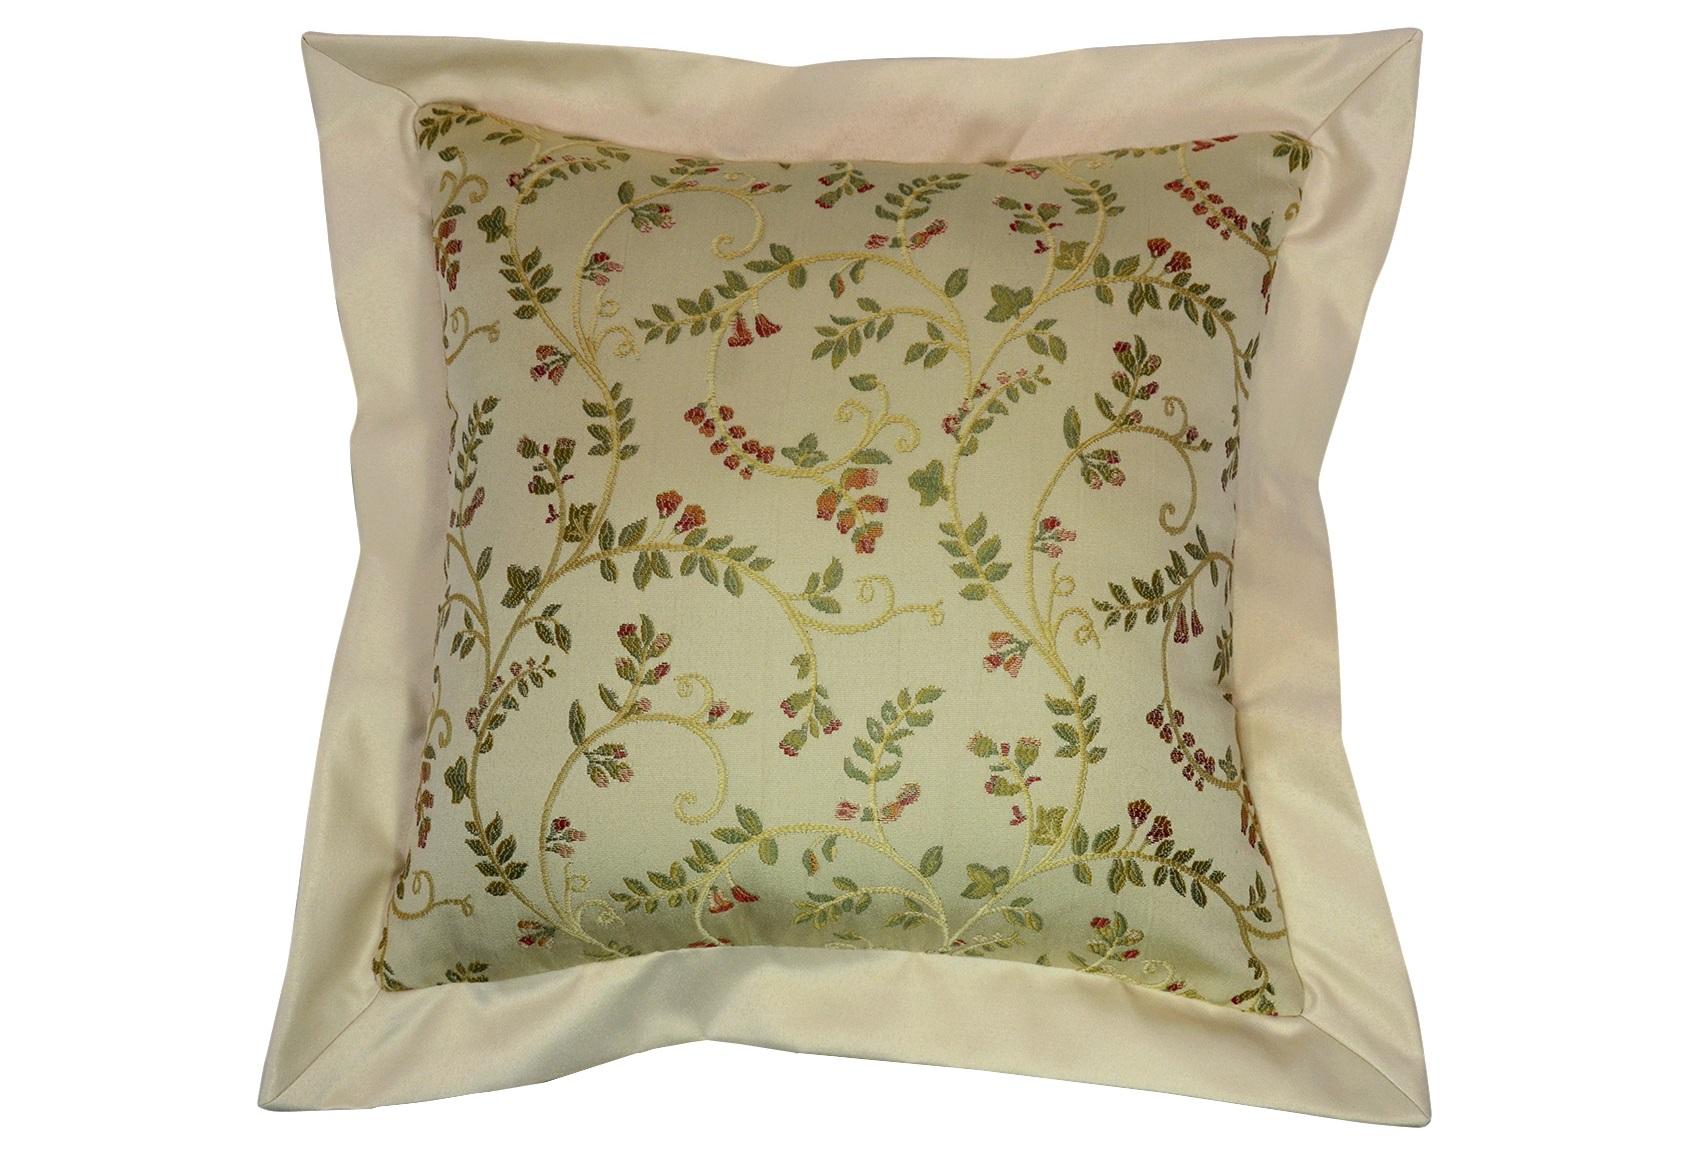 Подушка Arabelle VanillaКвадратные подушки и наволочки<br>Декоративная  подушка .Чехол съемный.<br><br>Material: Вискоза<br>Ширина см: 50<br>Высота см: 50<br>Глубина см: 15